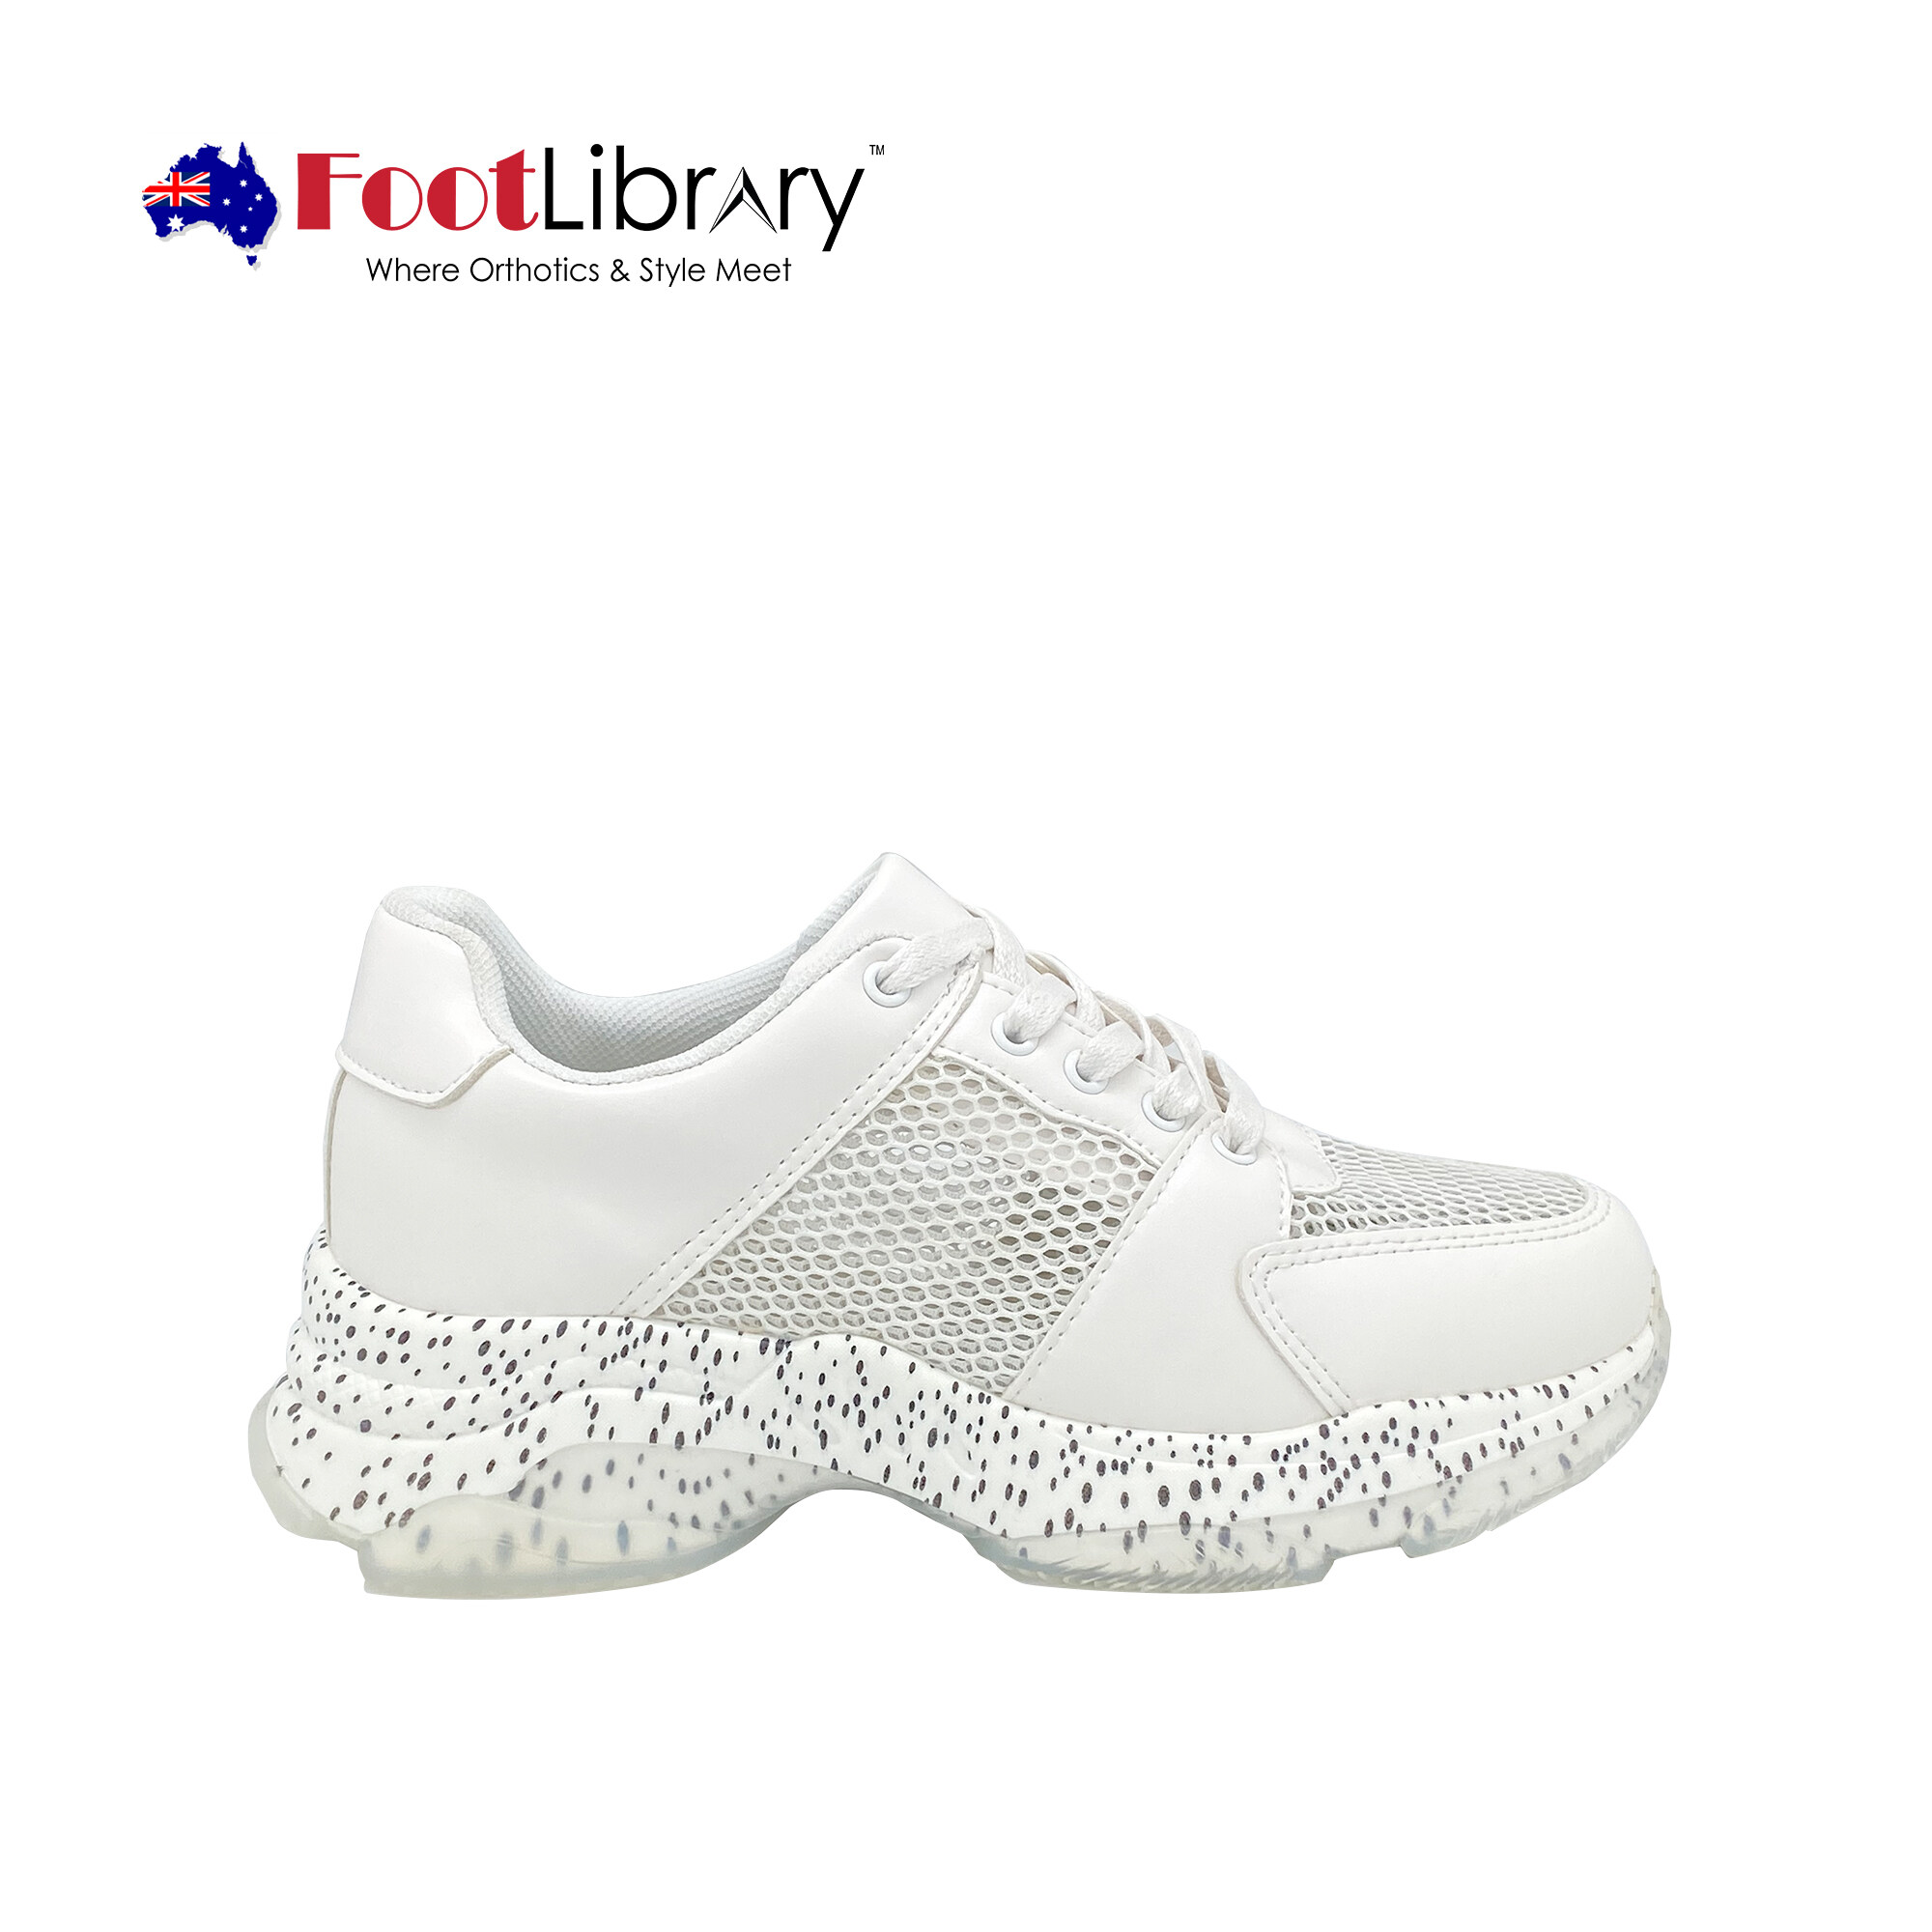 FootLibrary Women Shoes - BROOKLYN (MX003)